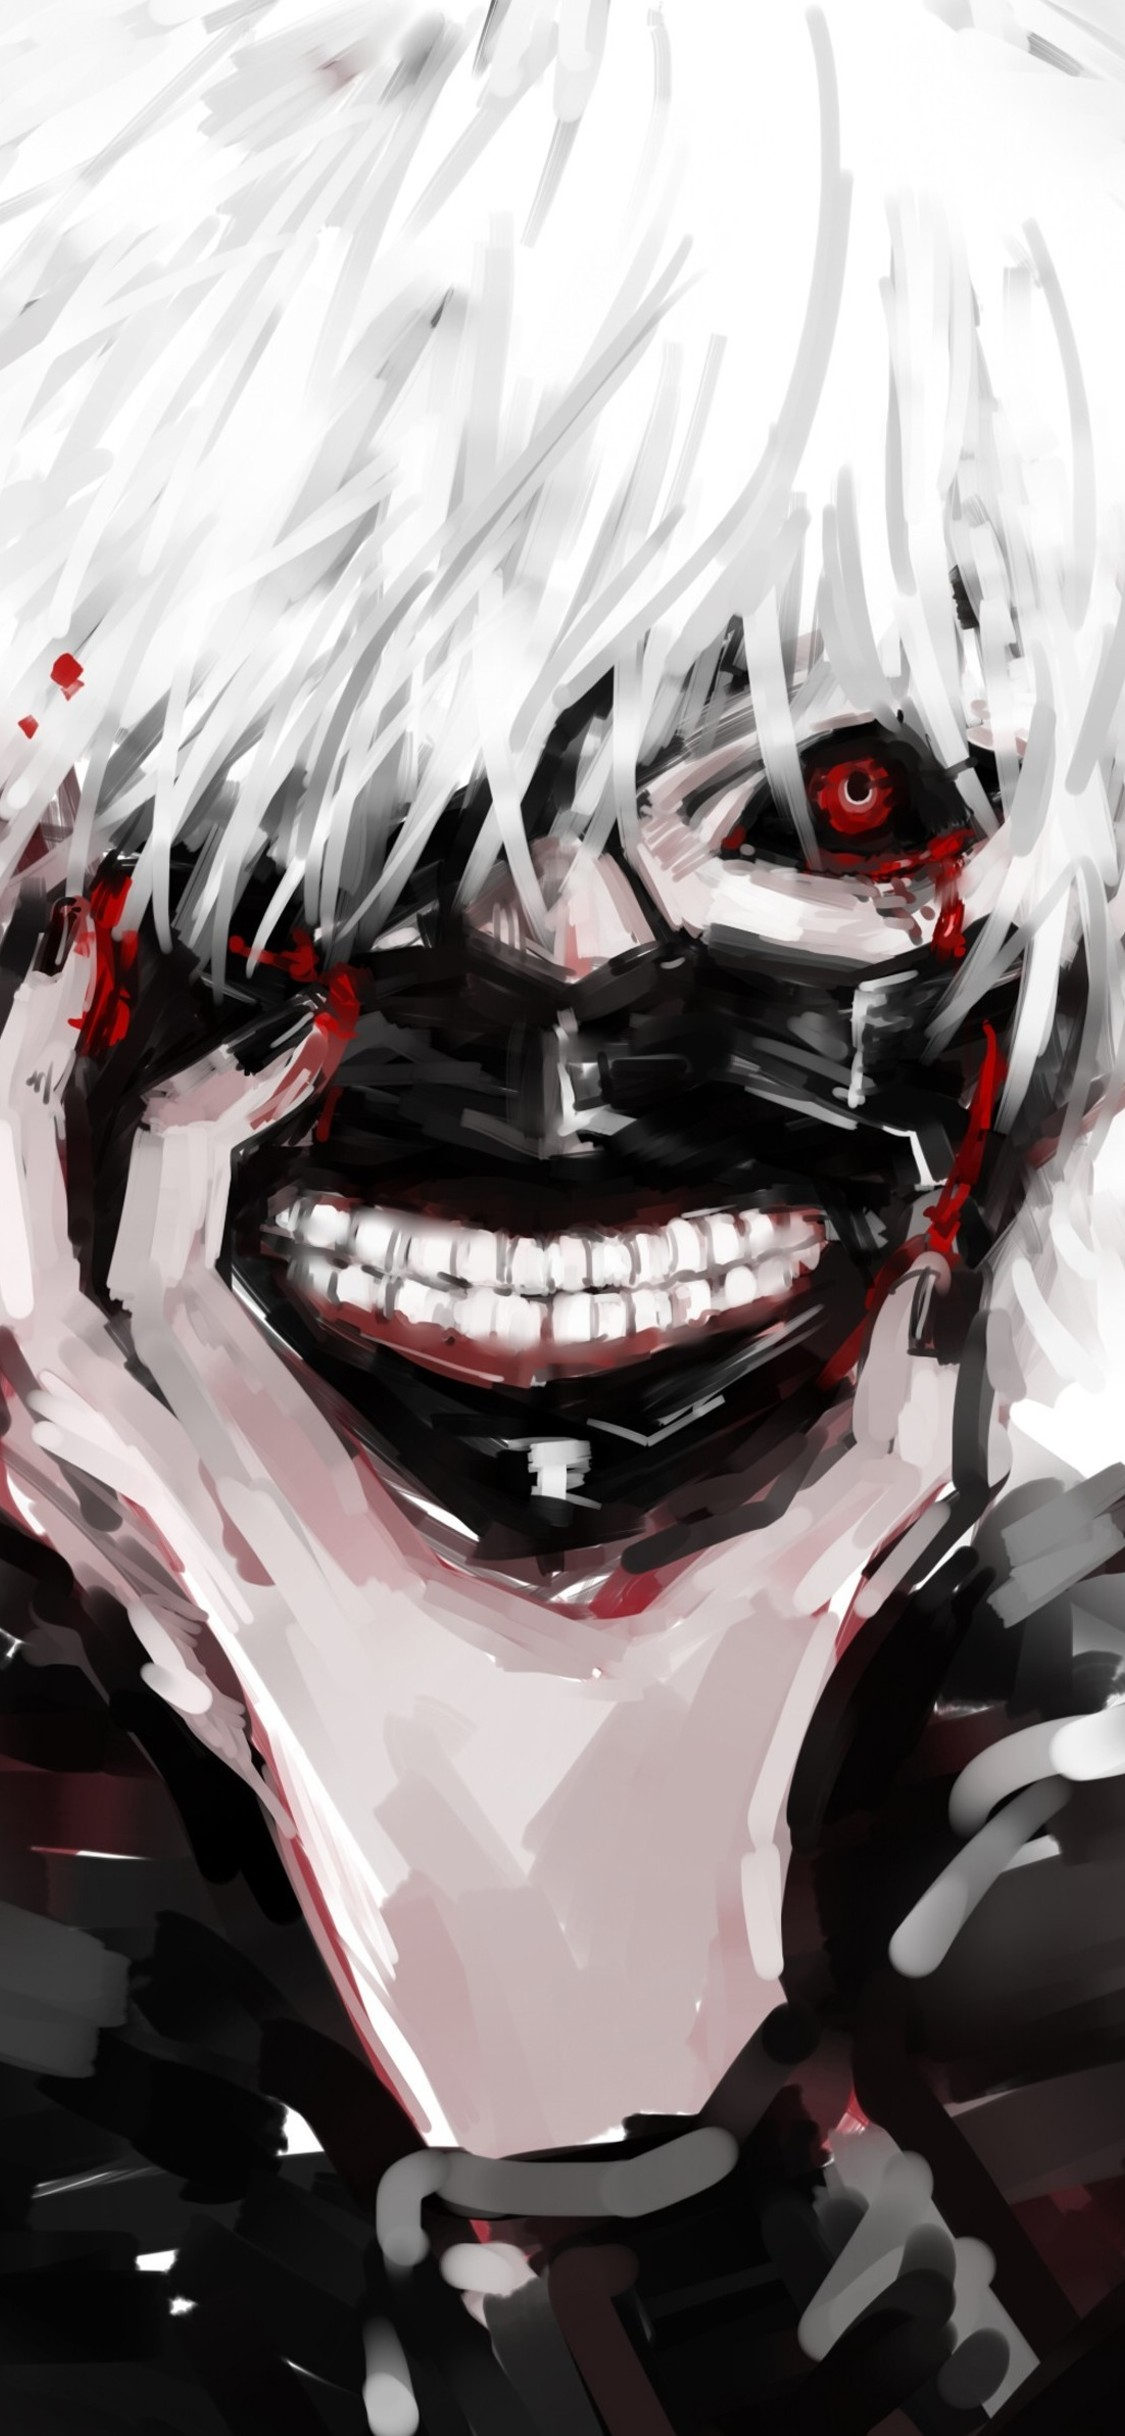 Tokyo Ghoul Kaneki Wallpaper Iphone 2253223 Hd